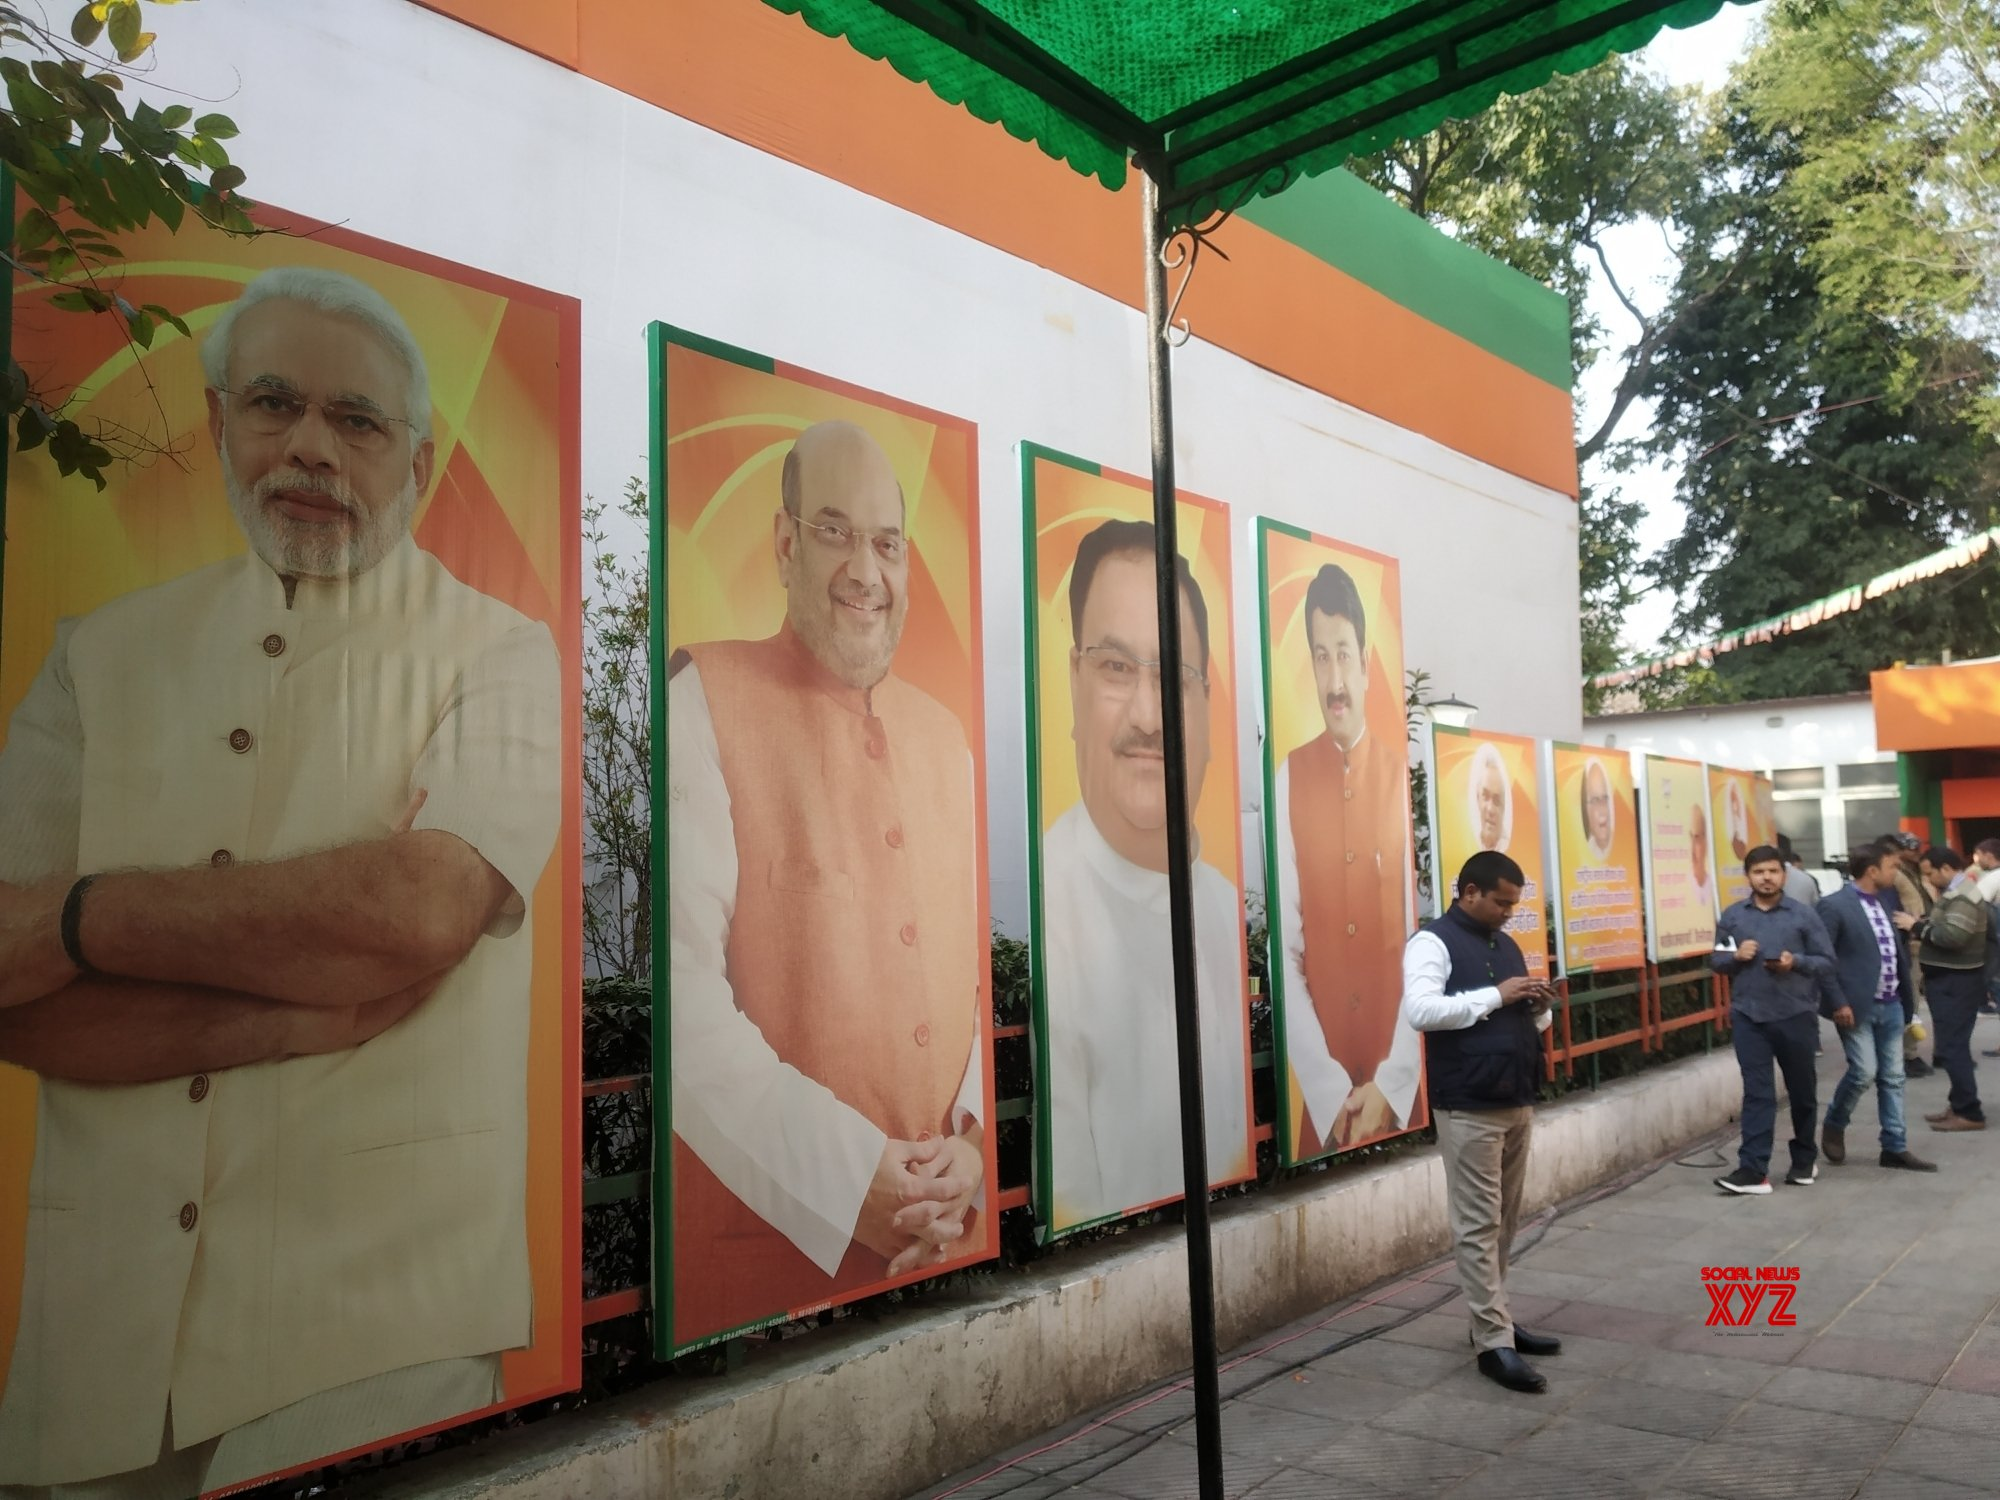 New Delhi: Delhi Polls 2020 results - Delhi BJP office during counting of votes #Gallery